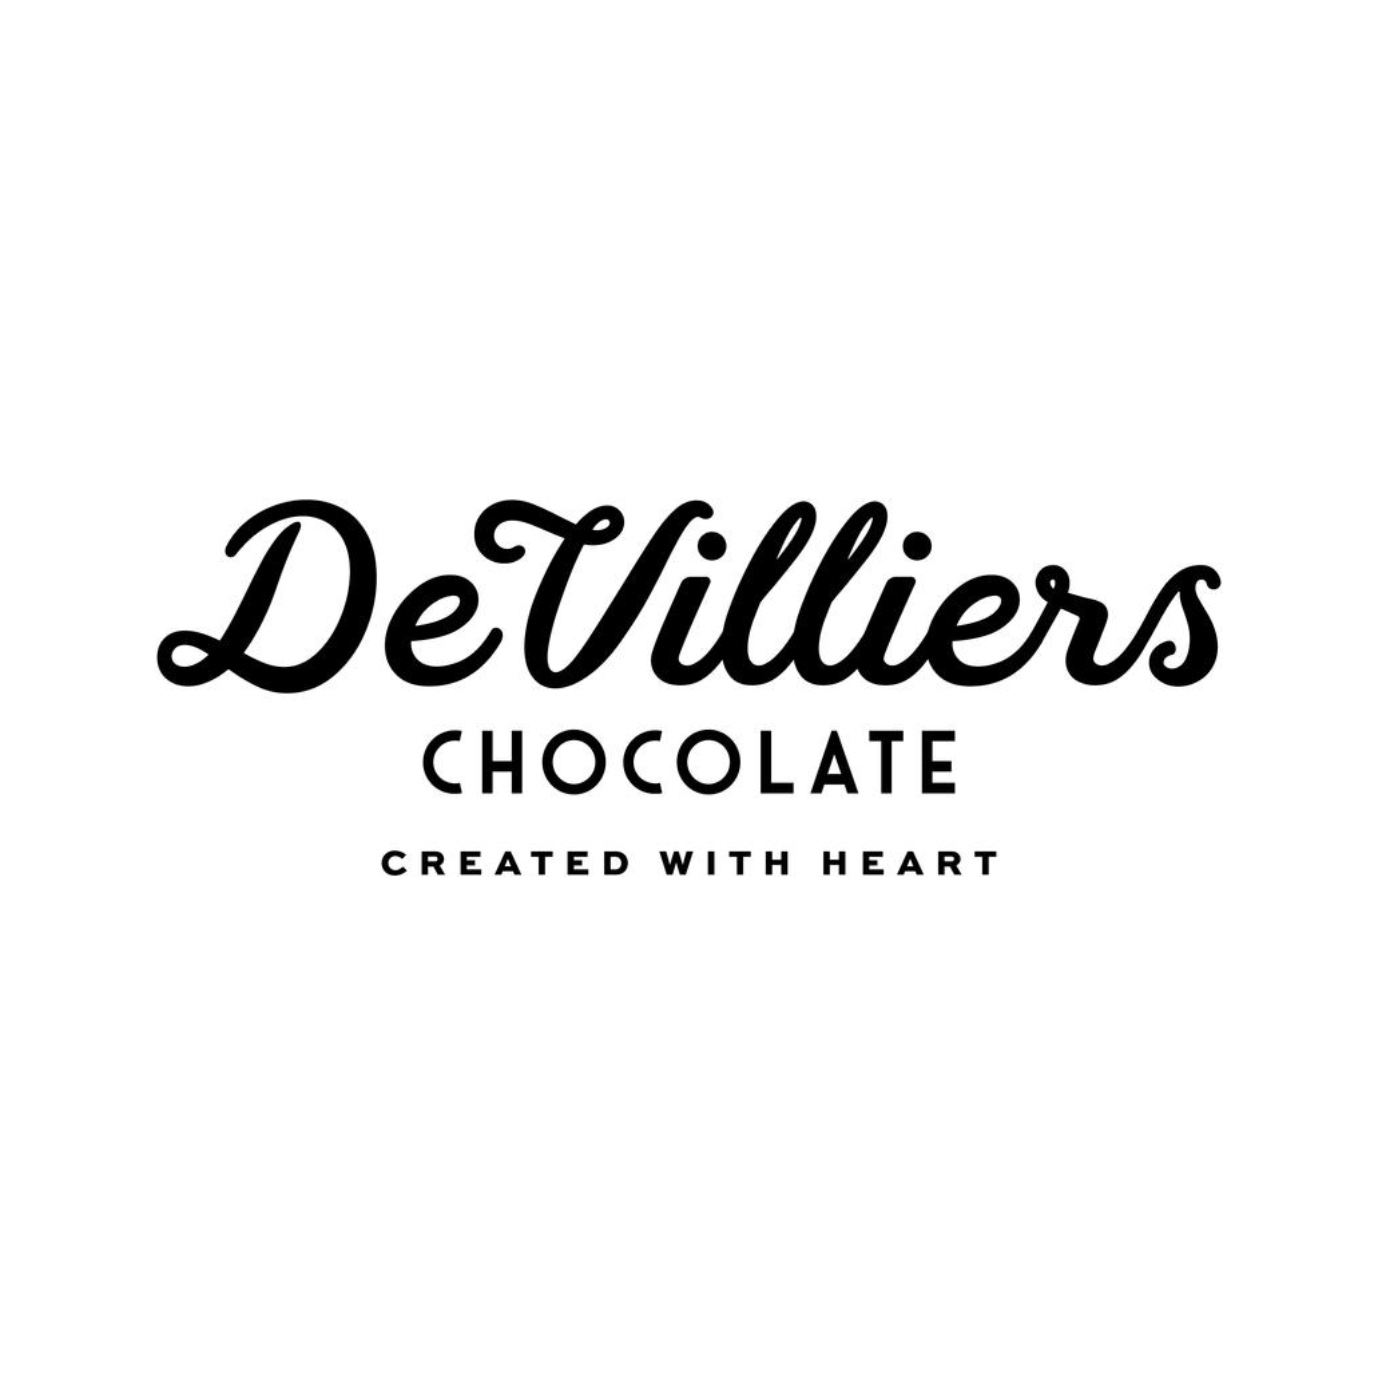 De Villiers Chocolate logo - Keto Certified by the Paleo Foundation